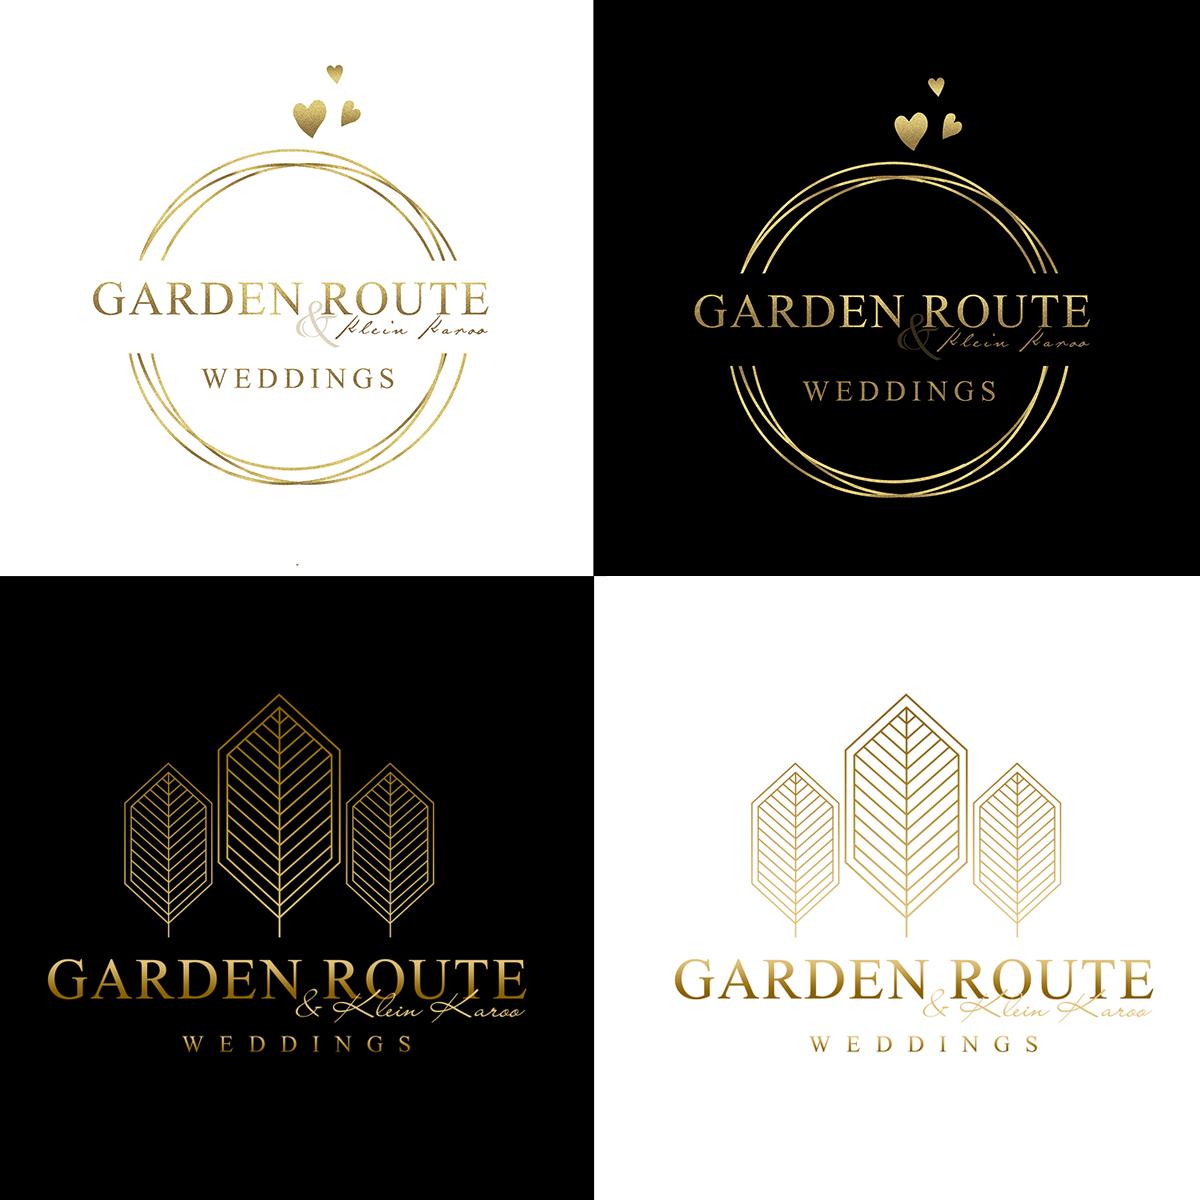 Garden Route and Klein Karoo Logo Designs by WOW Creative Design Studio